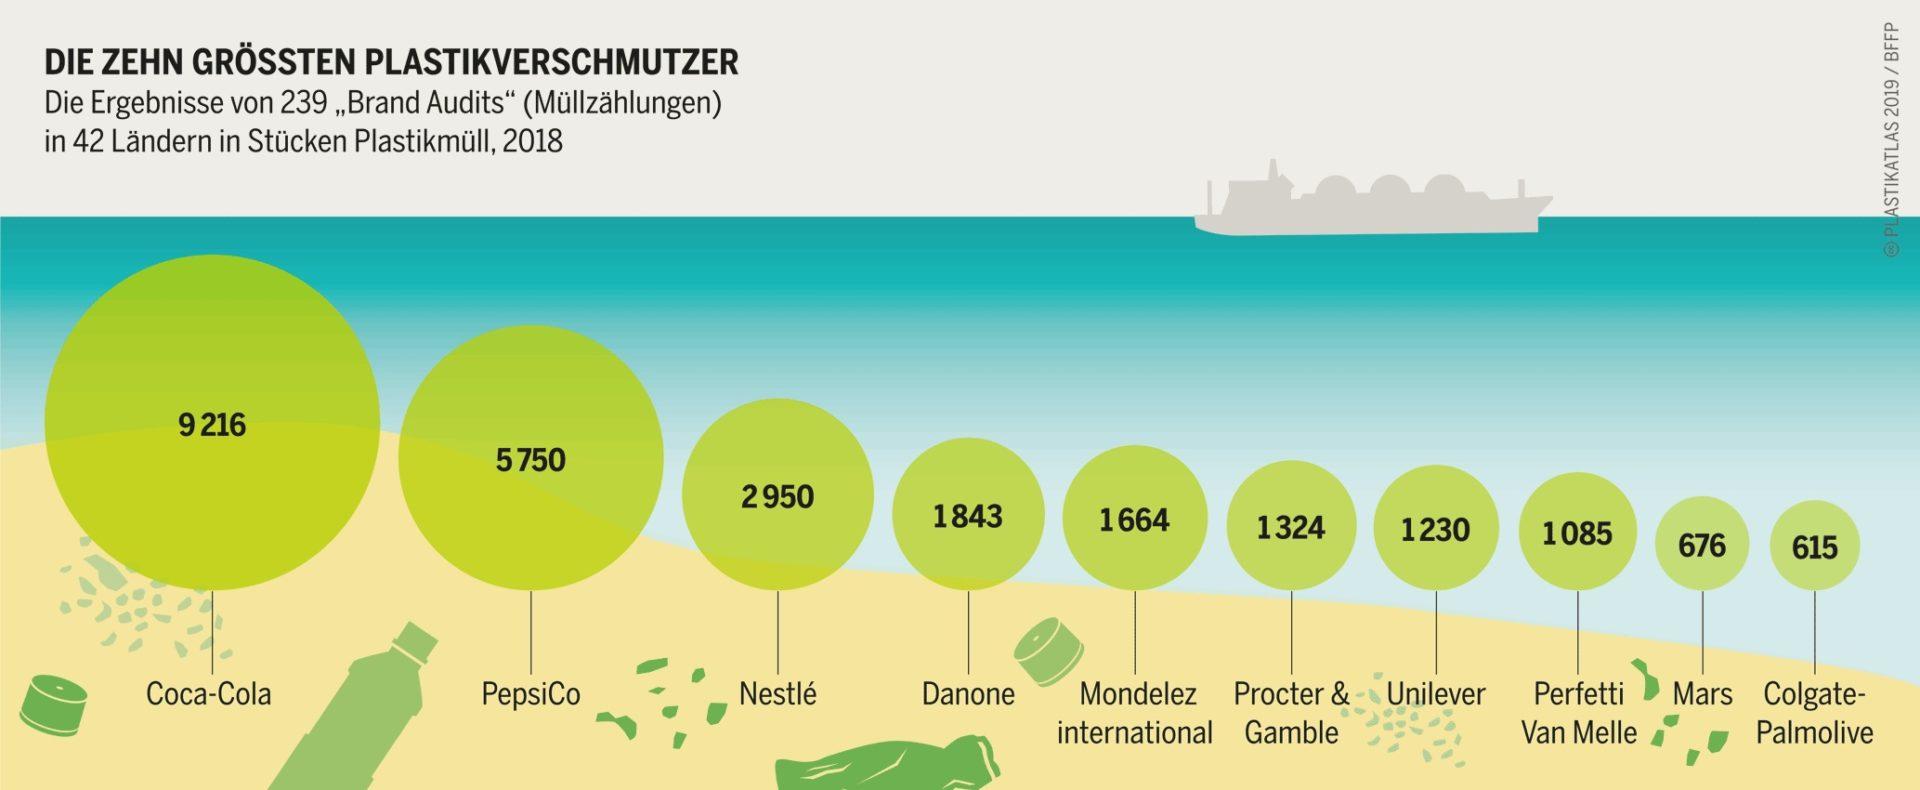 Grafik: Plastikatlas © Appenzeller/Hecher/Sack, CC-BY-4.0